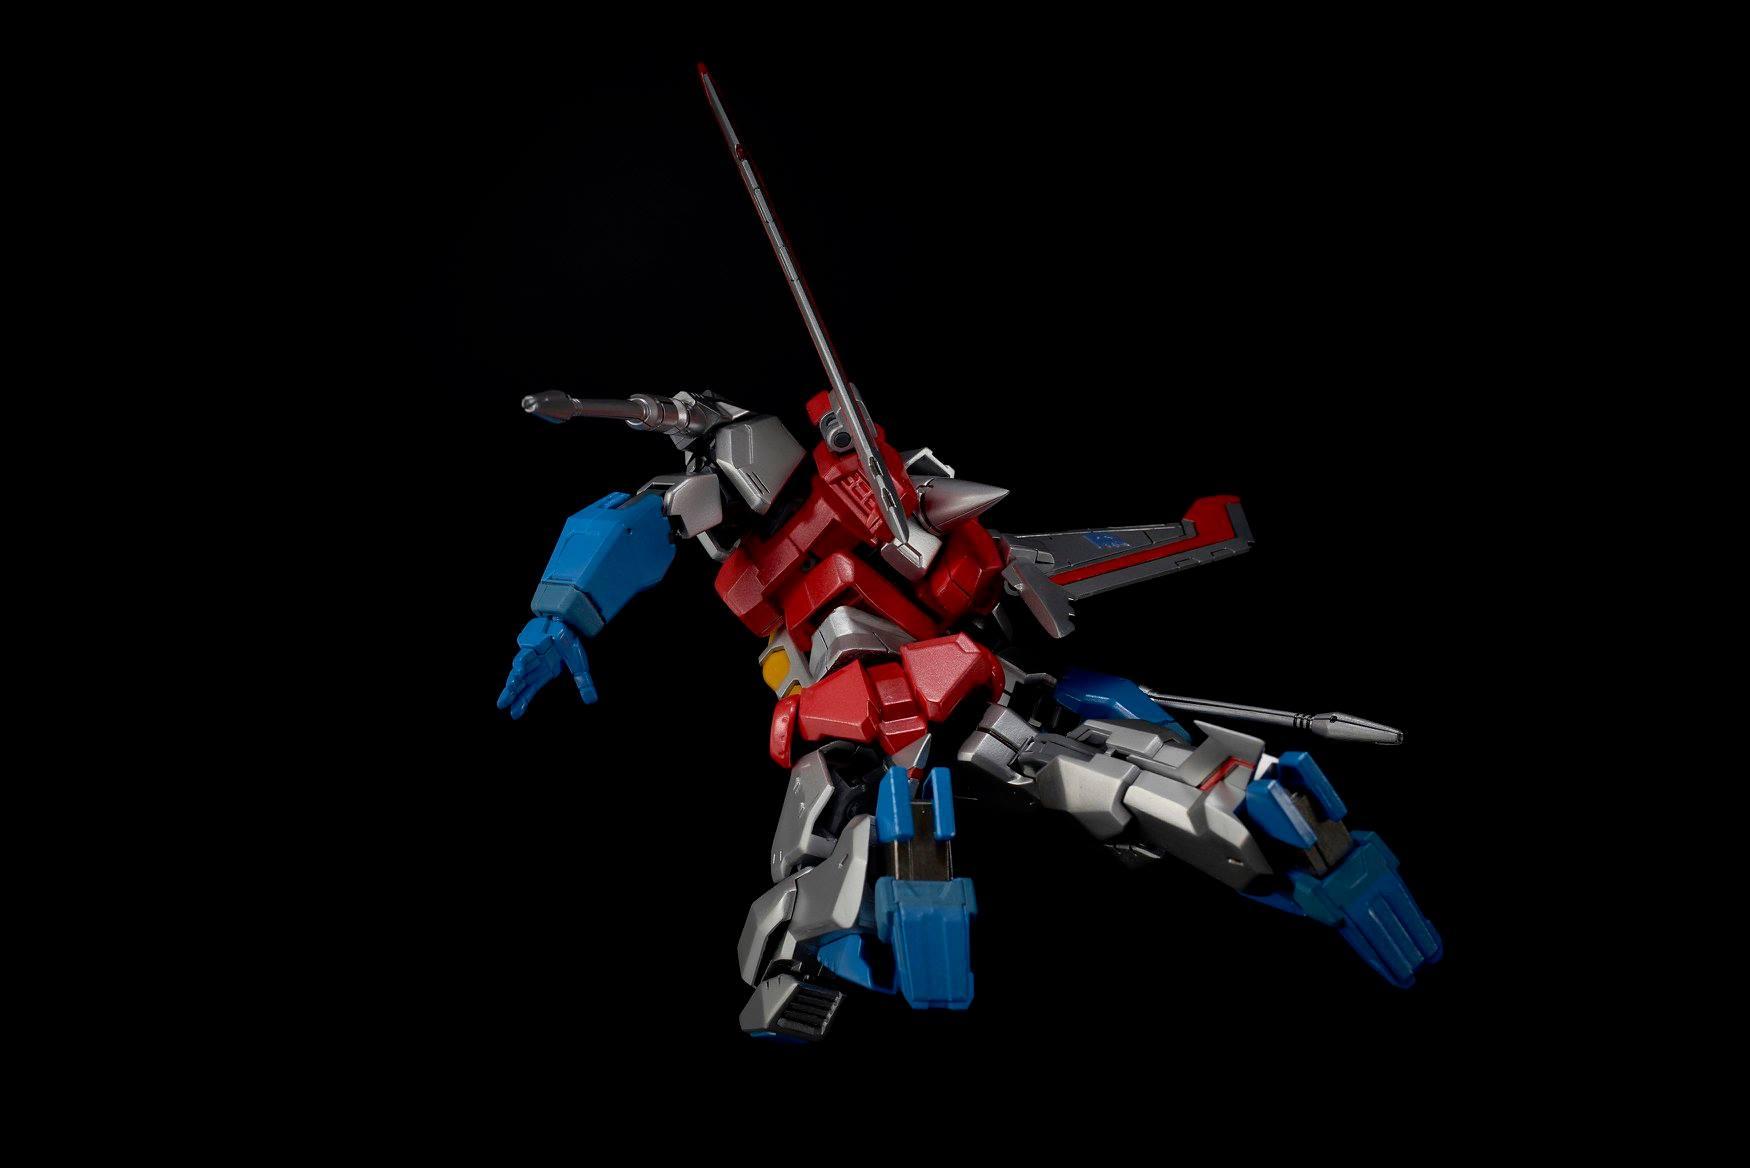 Transformers Starscream Furai Model